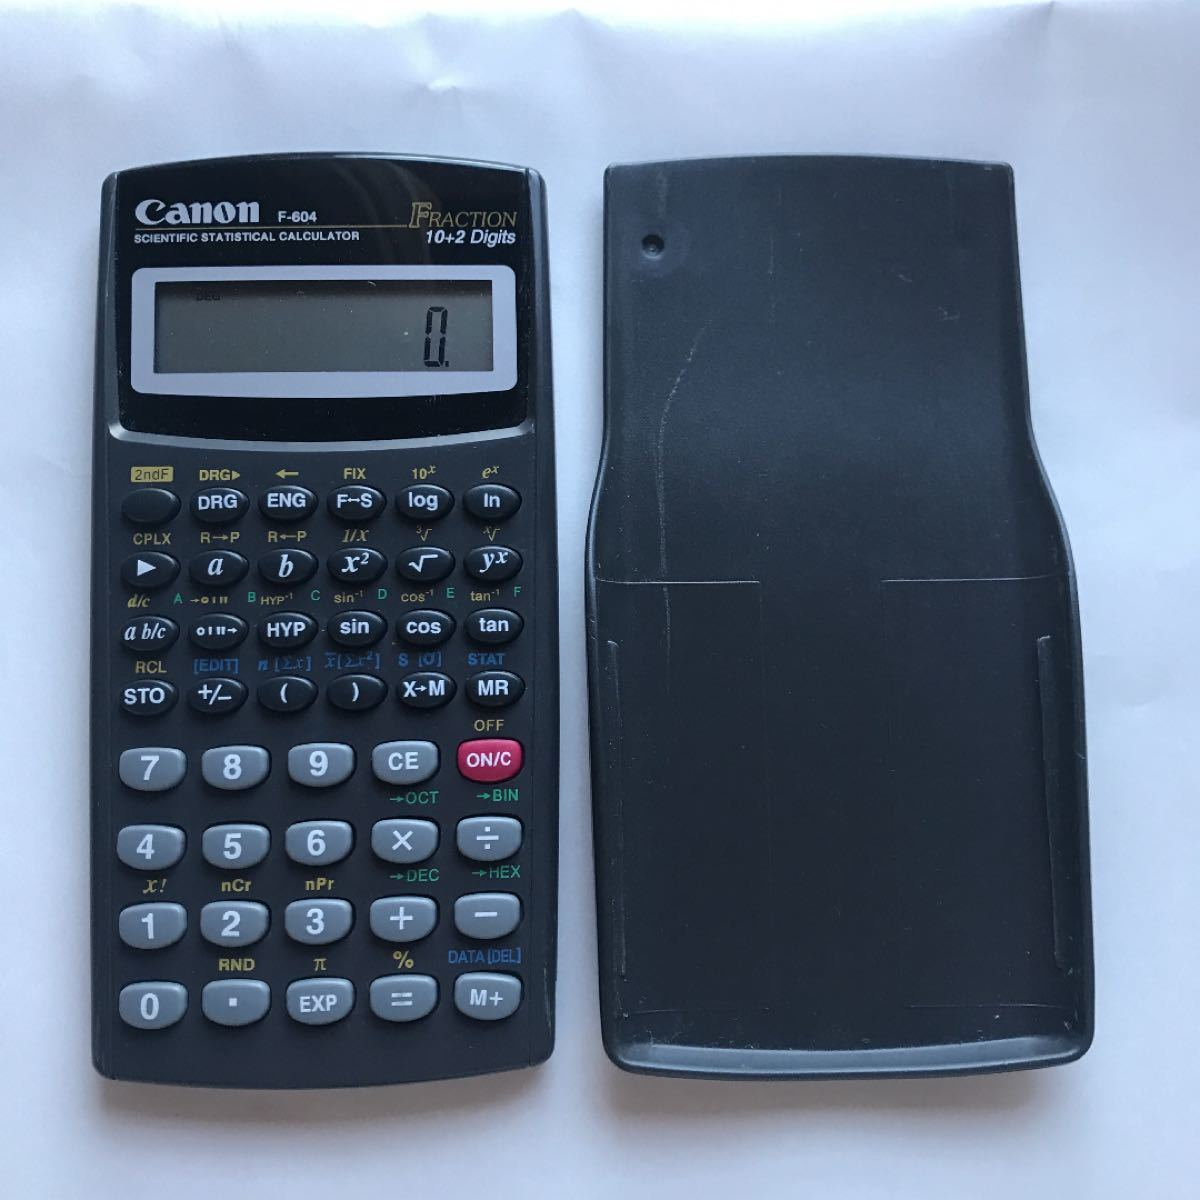 関数電卓 CanonF-604